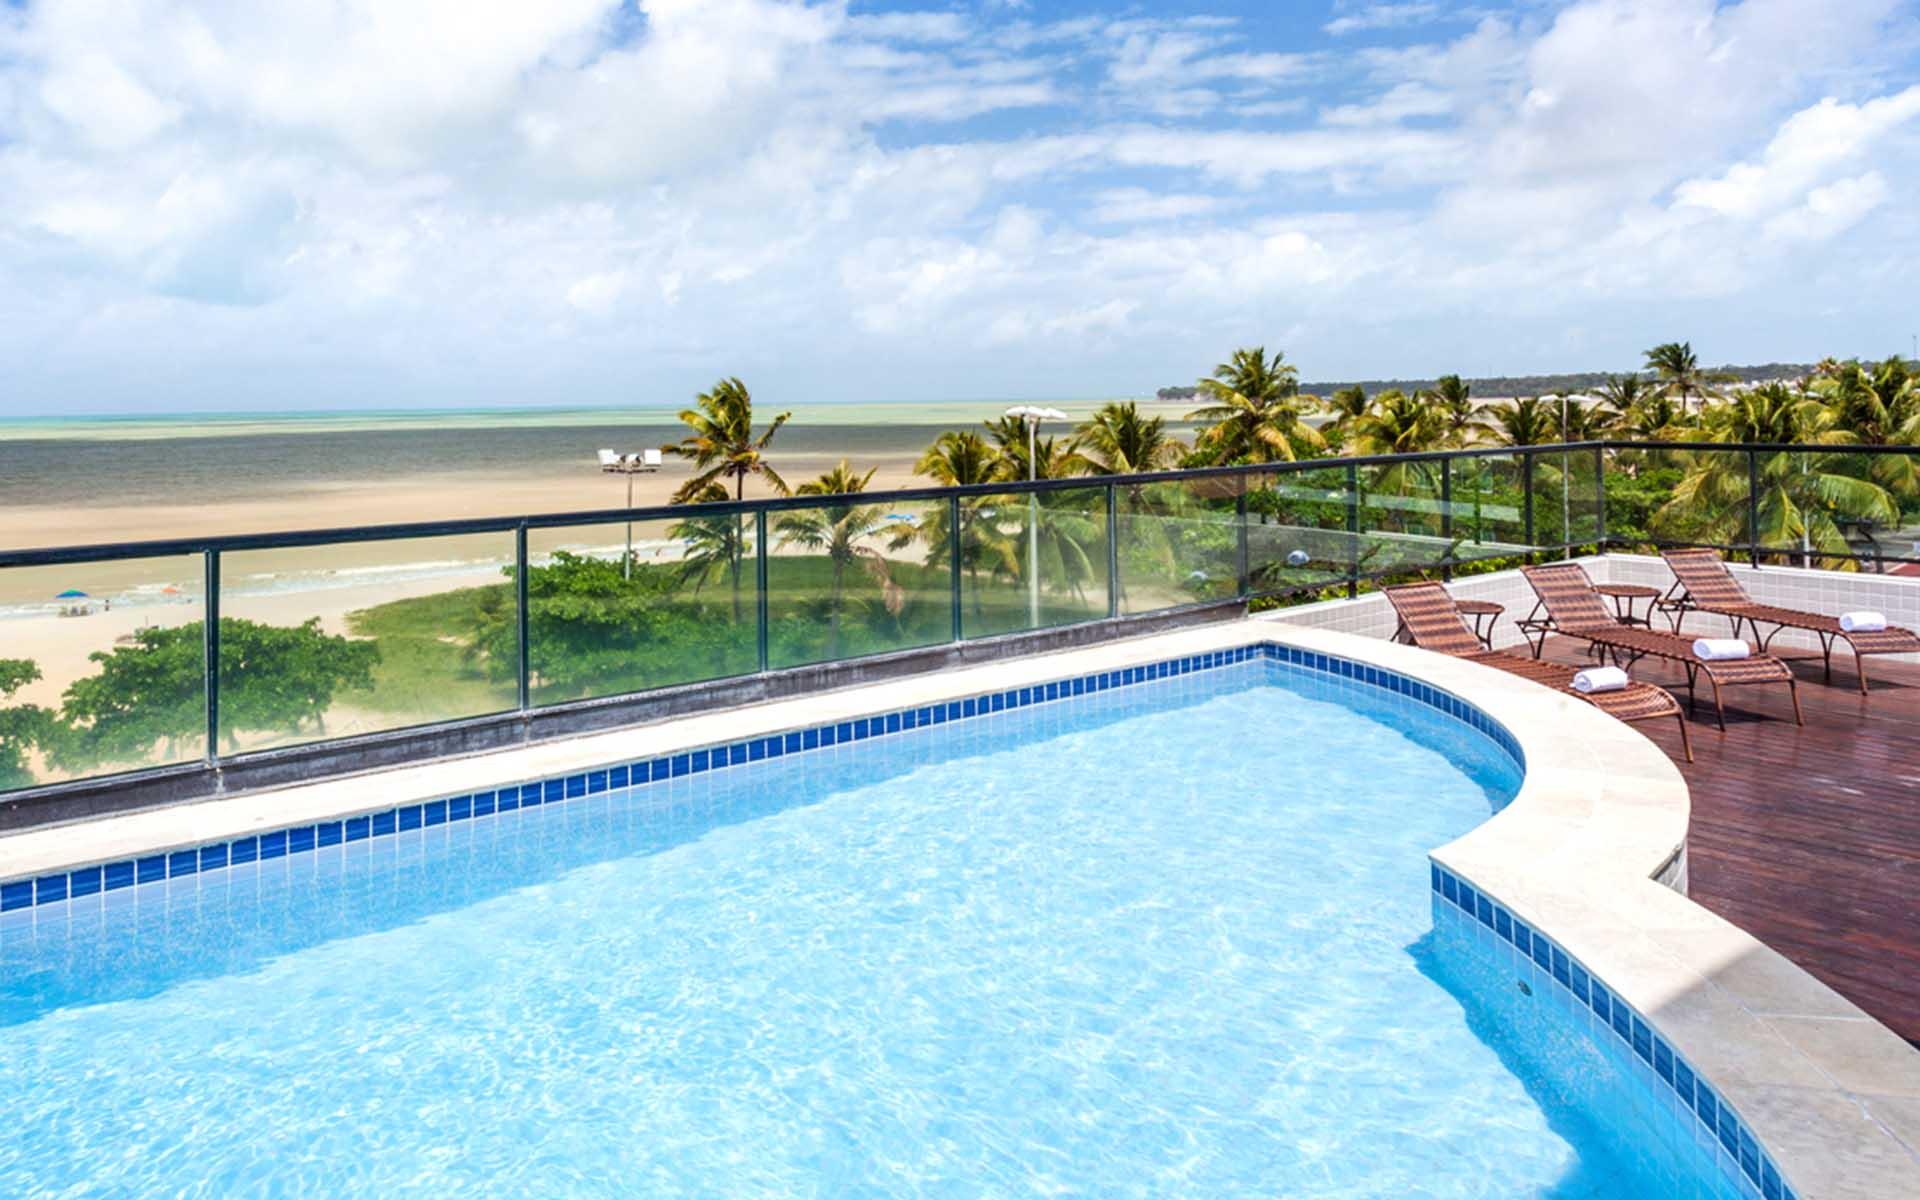 piscina_hotel_joao_pessoa_hplus_beach (1)